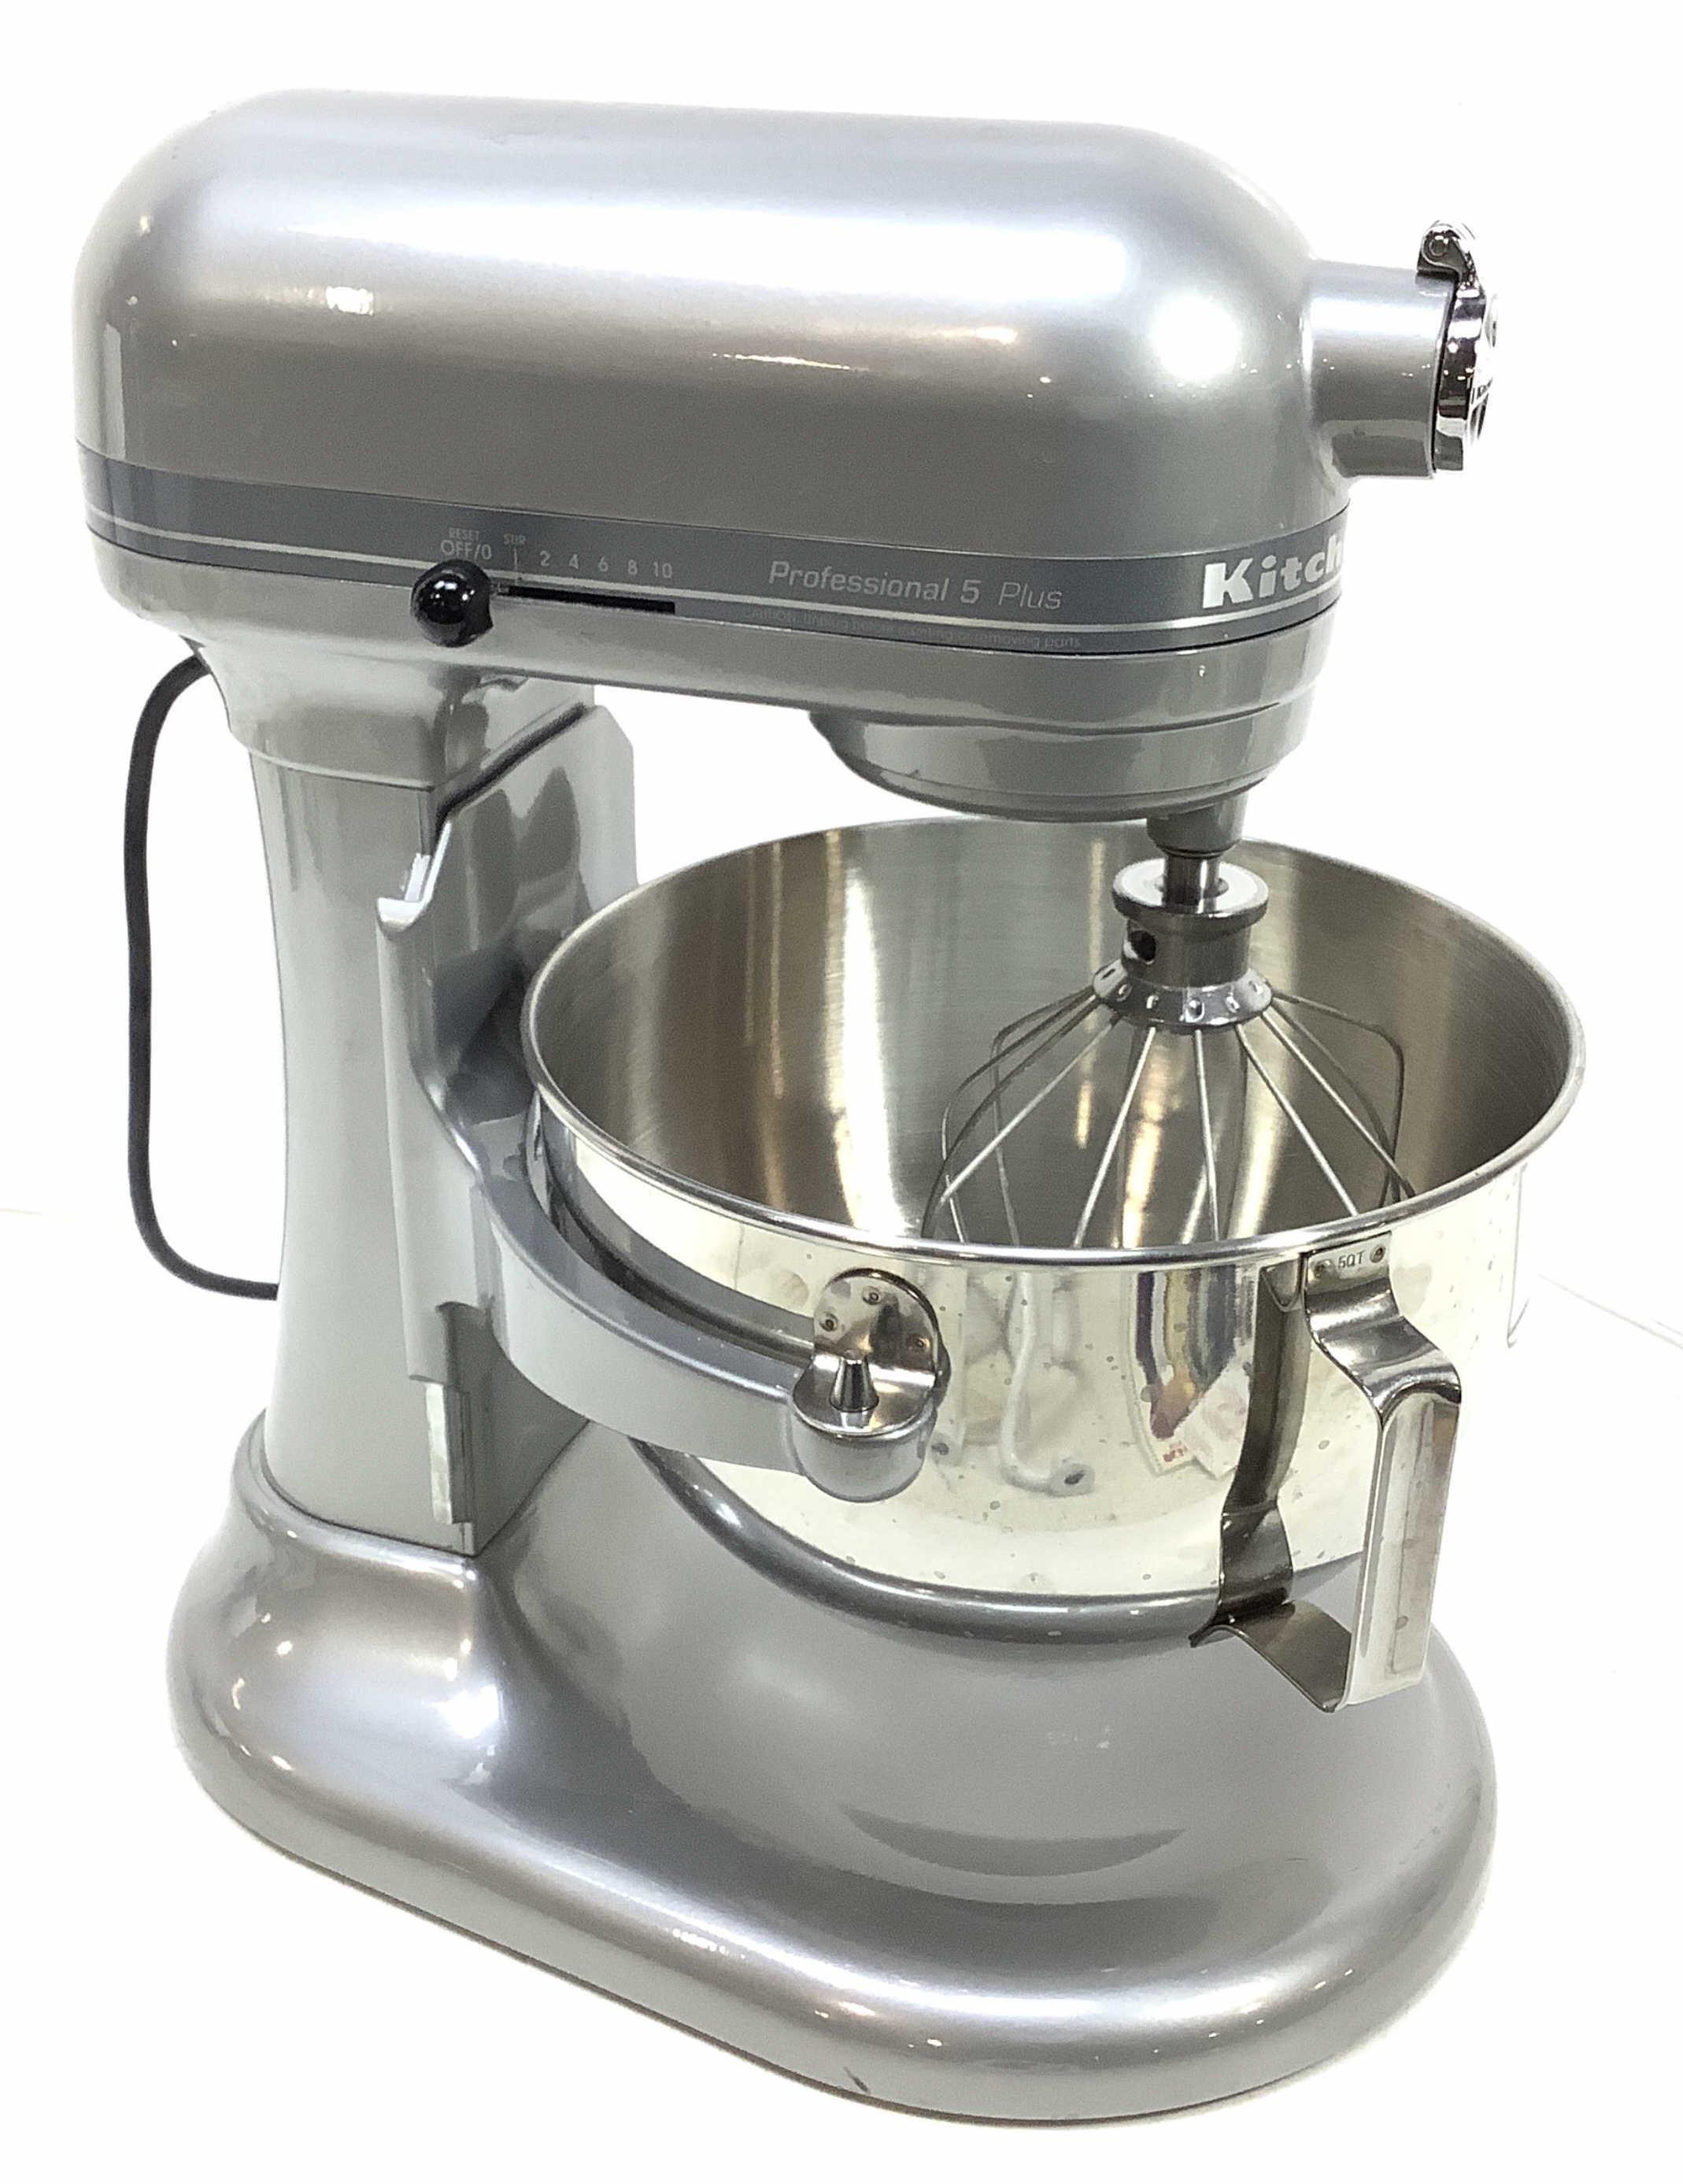 Kitchenaid Professional 5 Quart Stand Mixer